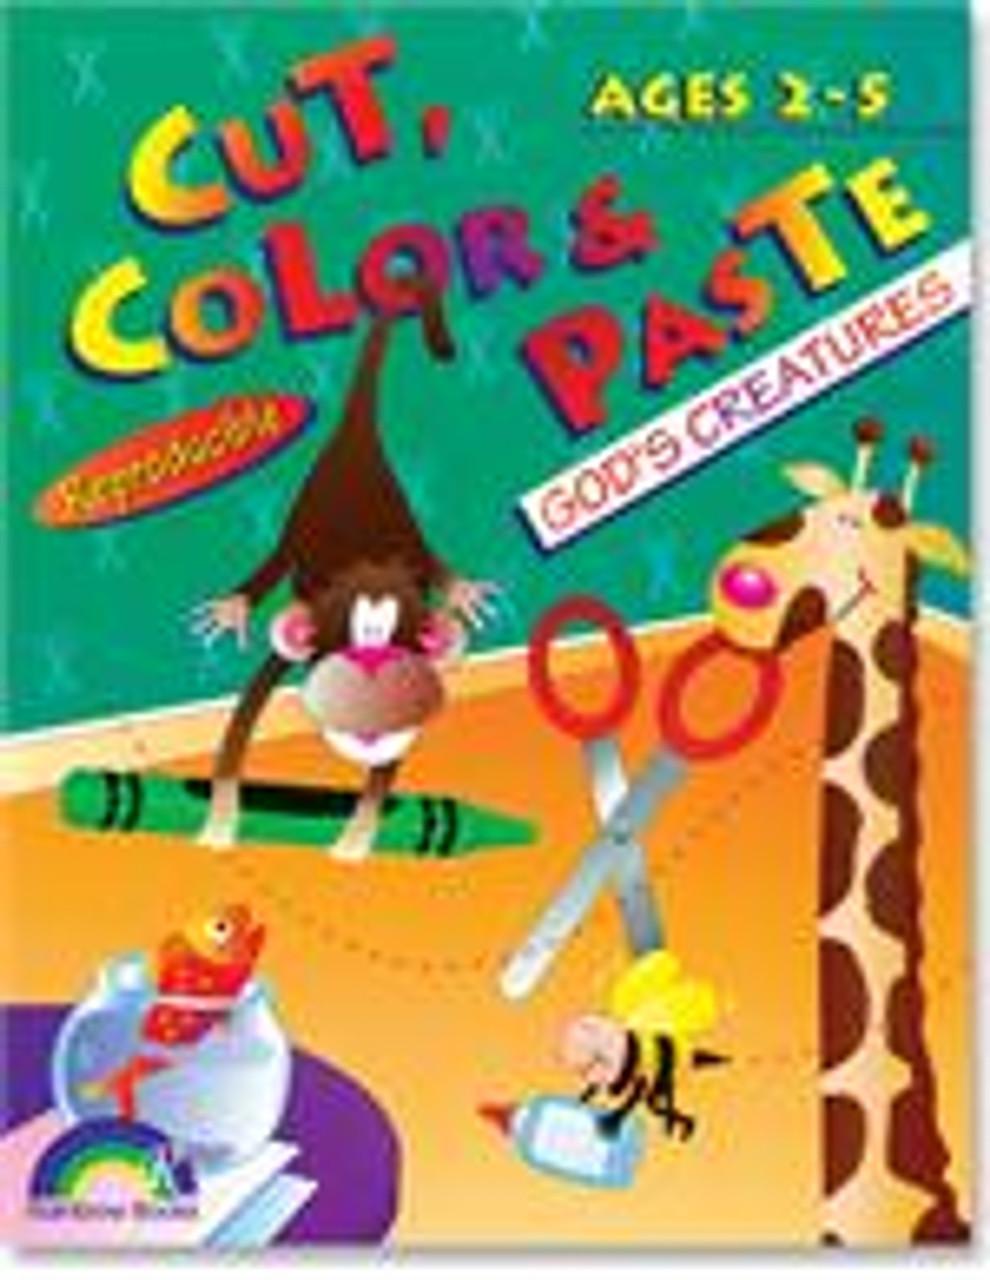 Cut, Color & Paste fun for Ages 2-5 God's Creatures